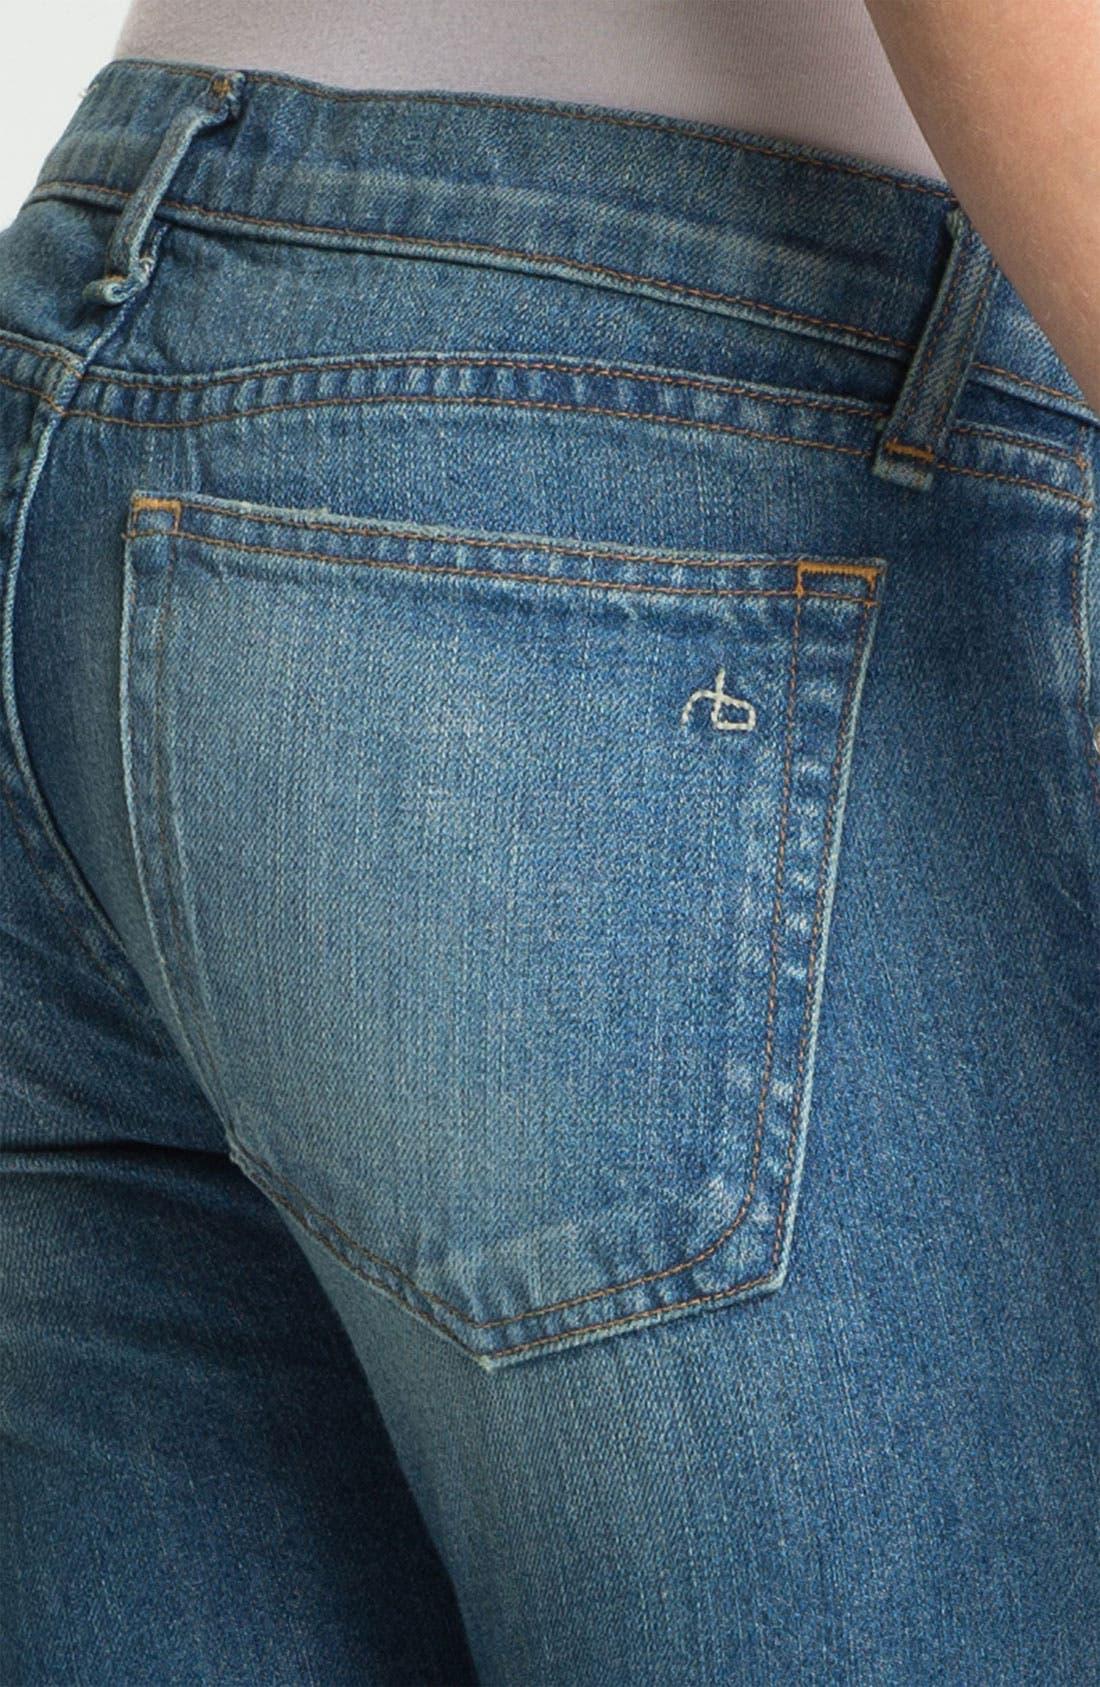 Alternate Image 4  - rag & bone/JEAN 'The Dre' Patch Detail Rigid Jeans